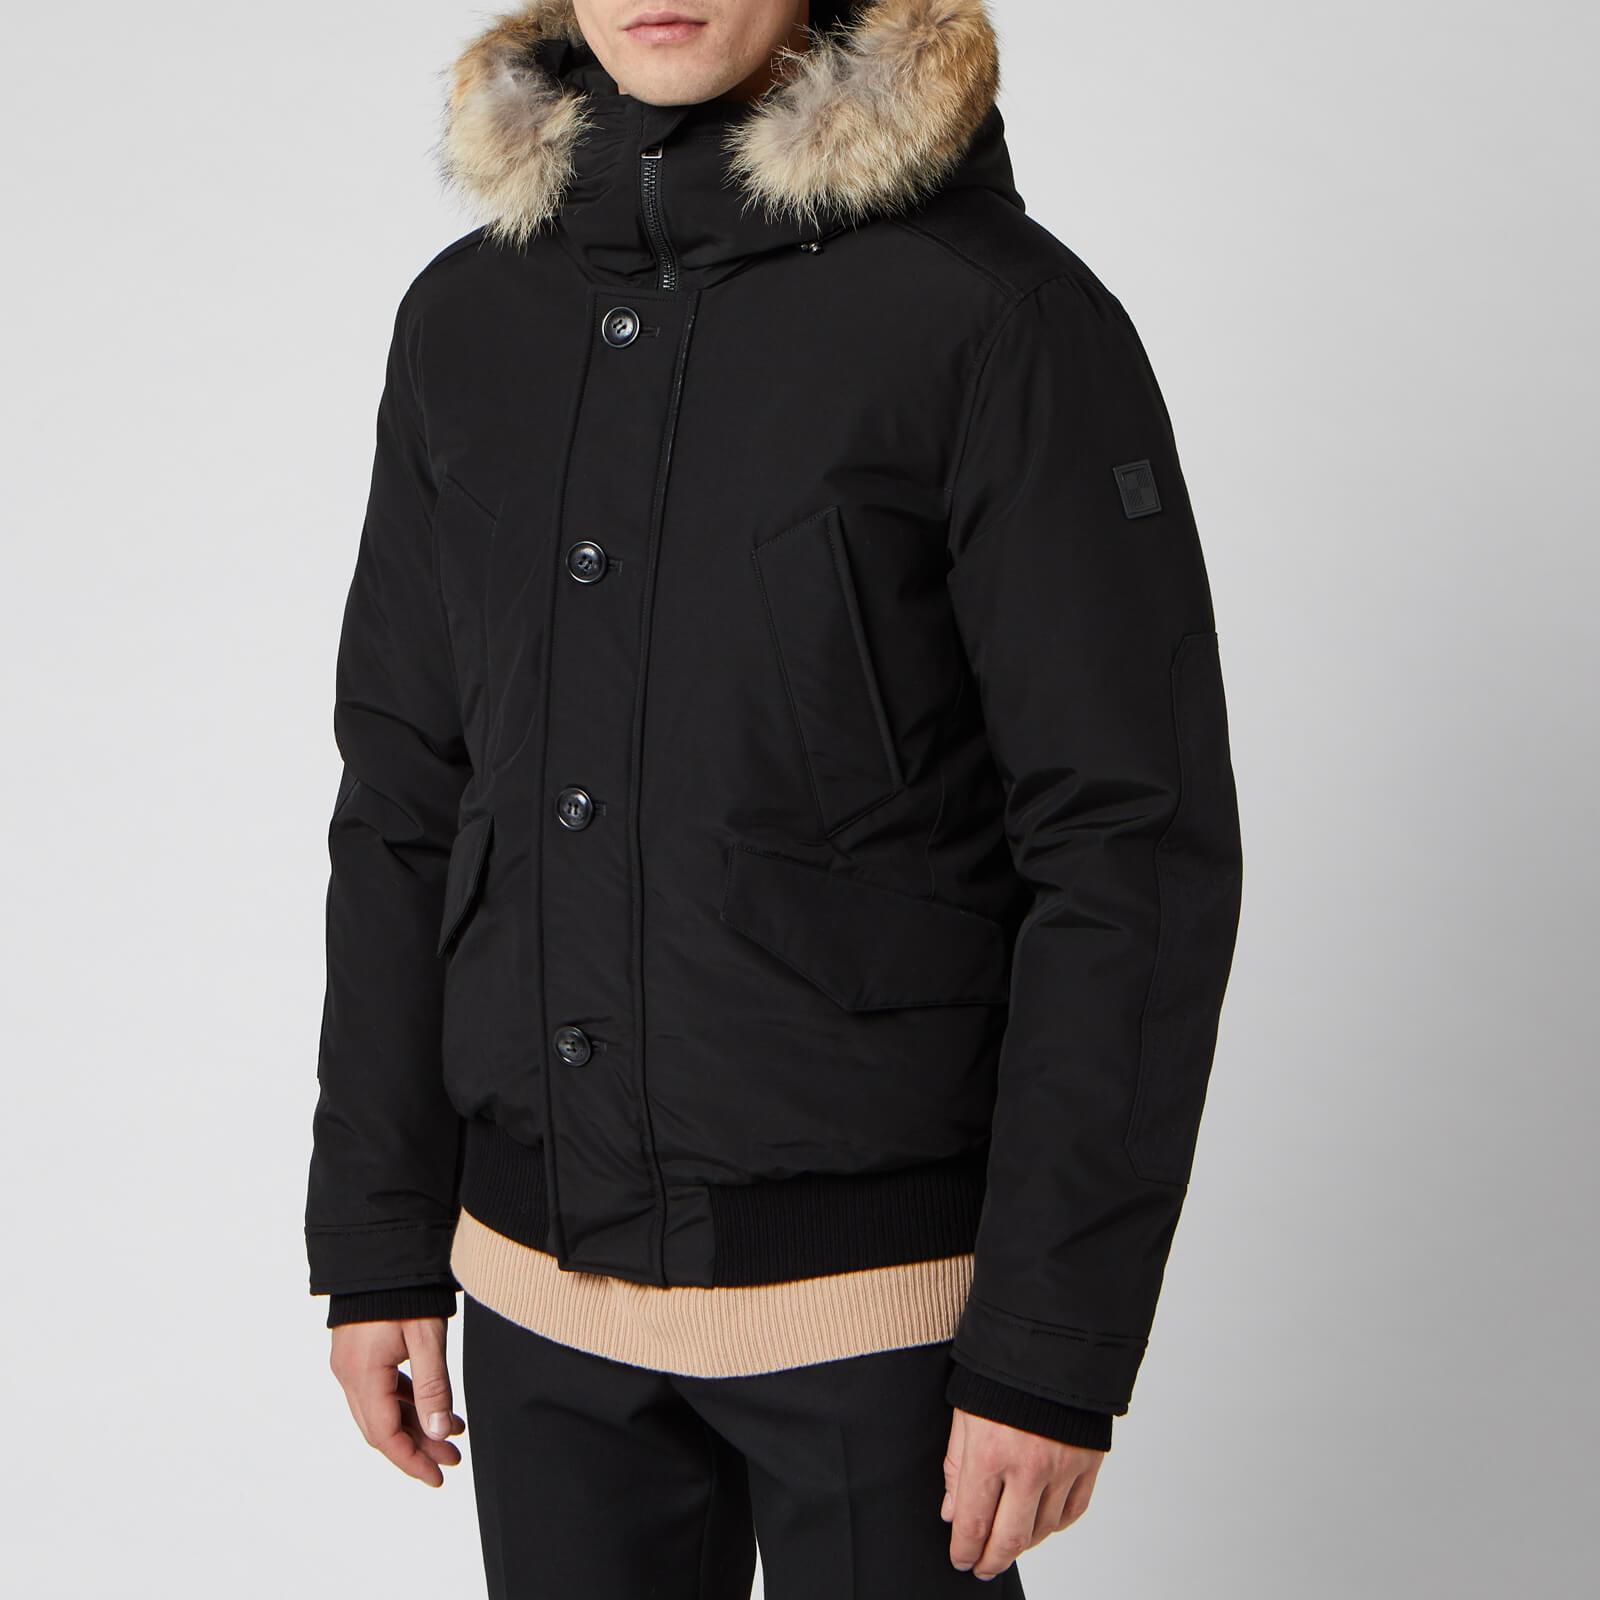 Woolrich Men's Polar Jacket - Black - M